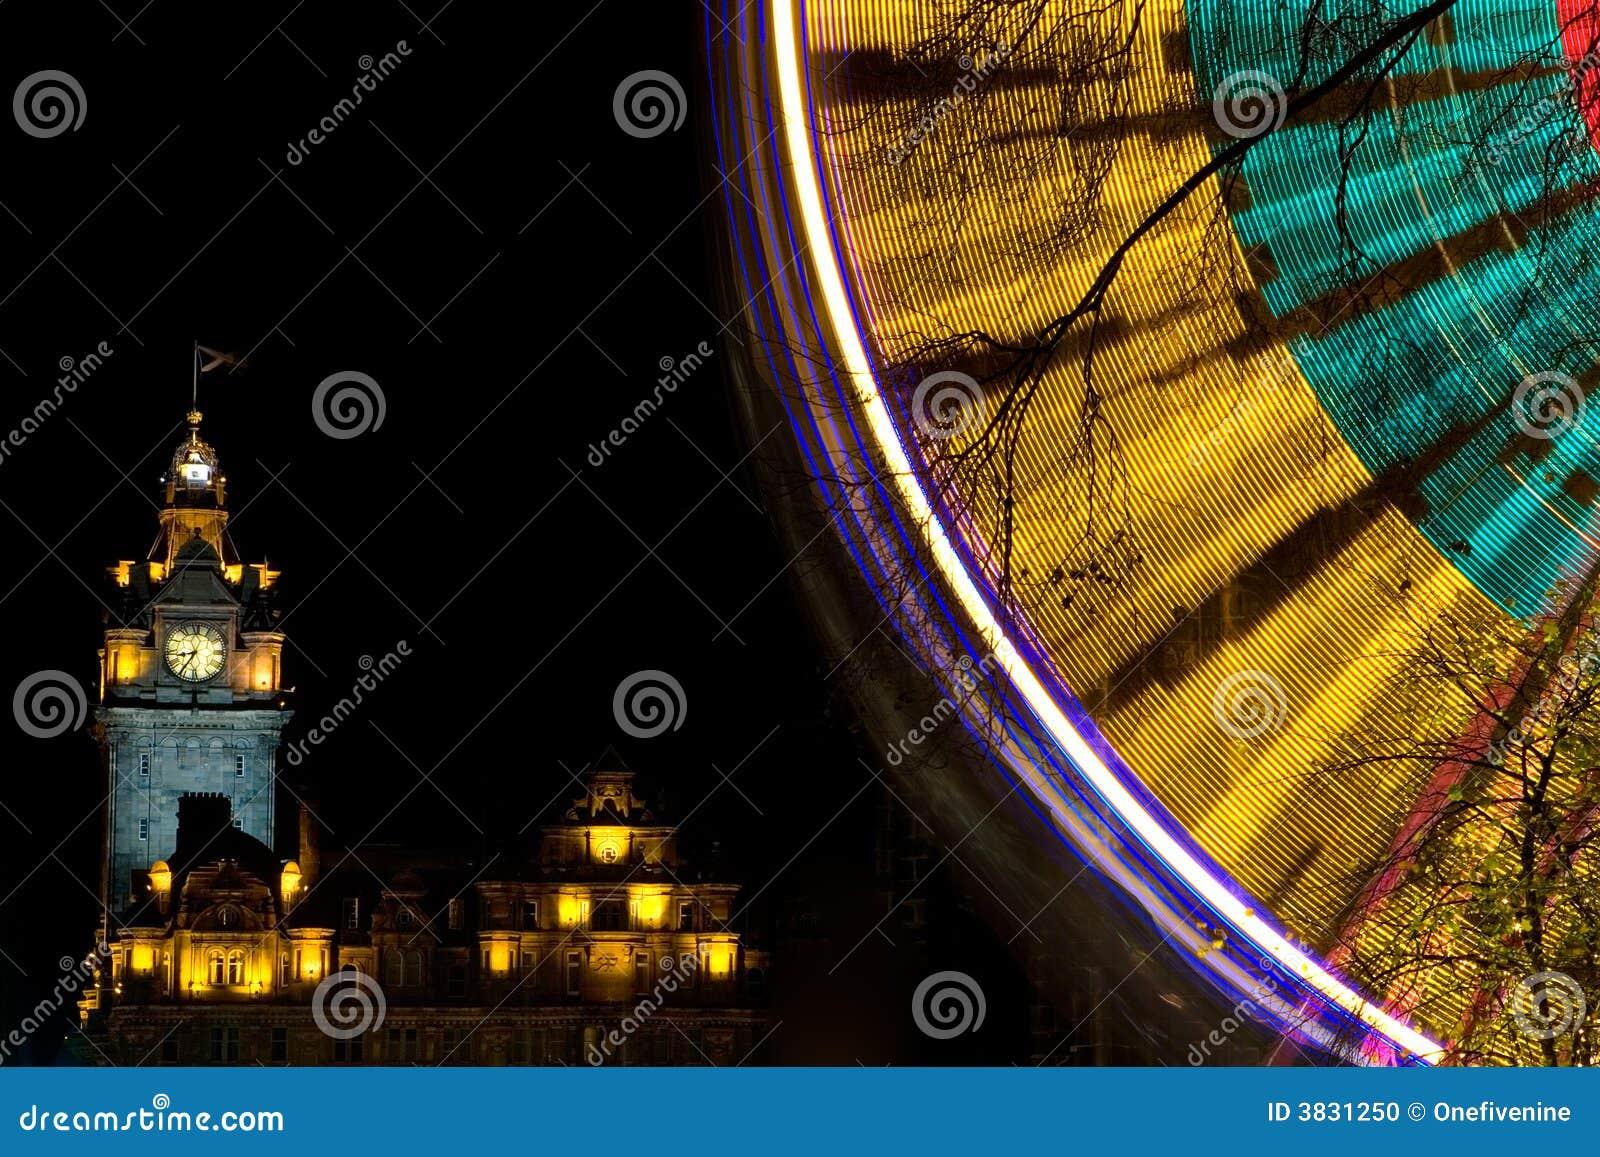 Edinburgh Christmas Lights Stock Photo Image 3831250